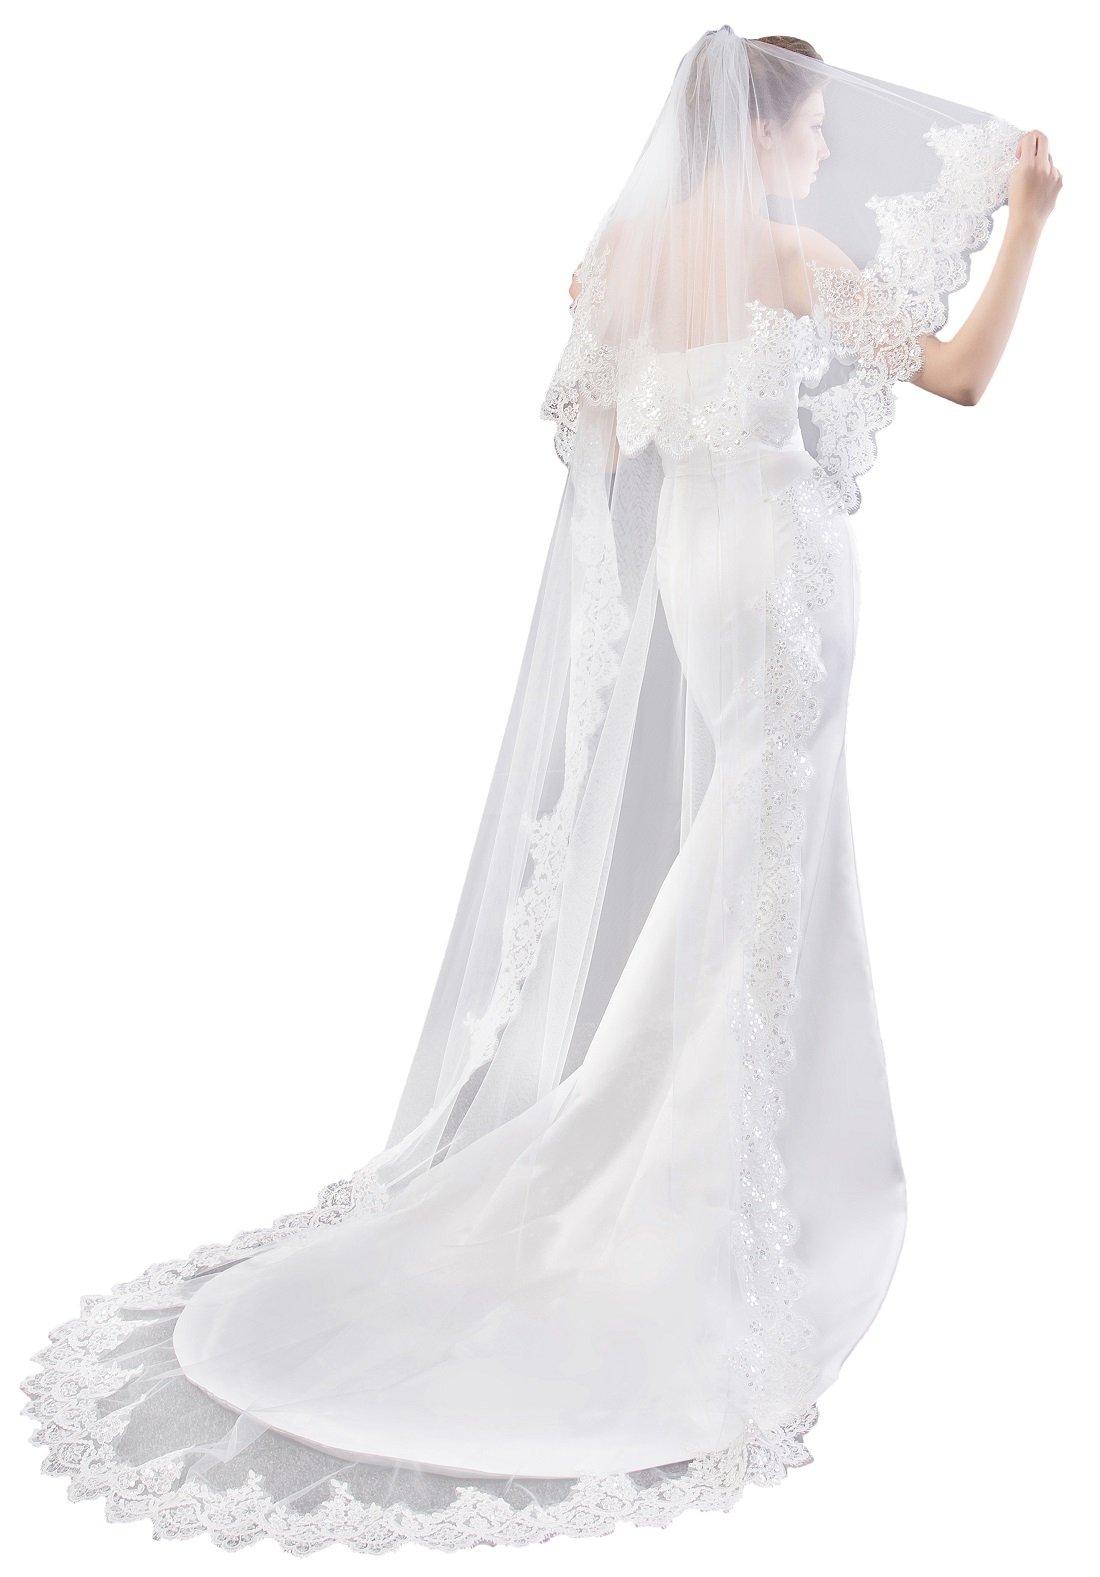 EllieHouse Women's Custom Made Long 2 Tier Wedding Bridal Veil With Free Comb Ivory E74